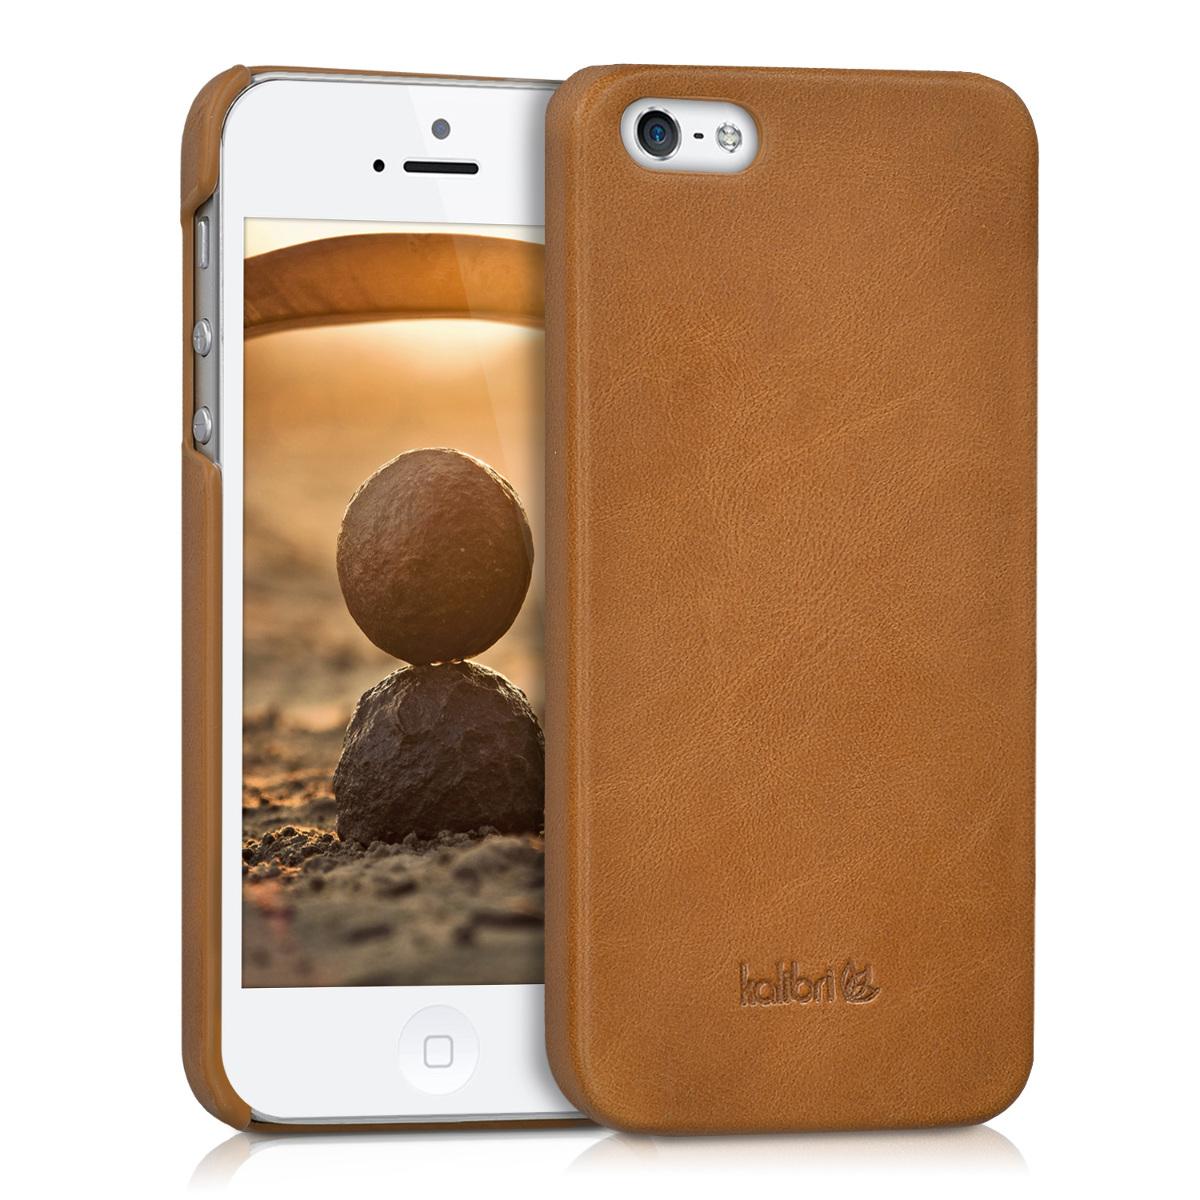 Kalibri Σκληρή Δερμάτινη Θήκη iPhone SE / 5S / 5 - Καφέ (38962.83)